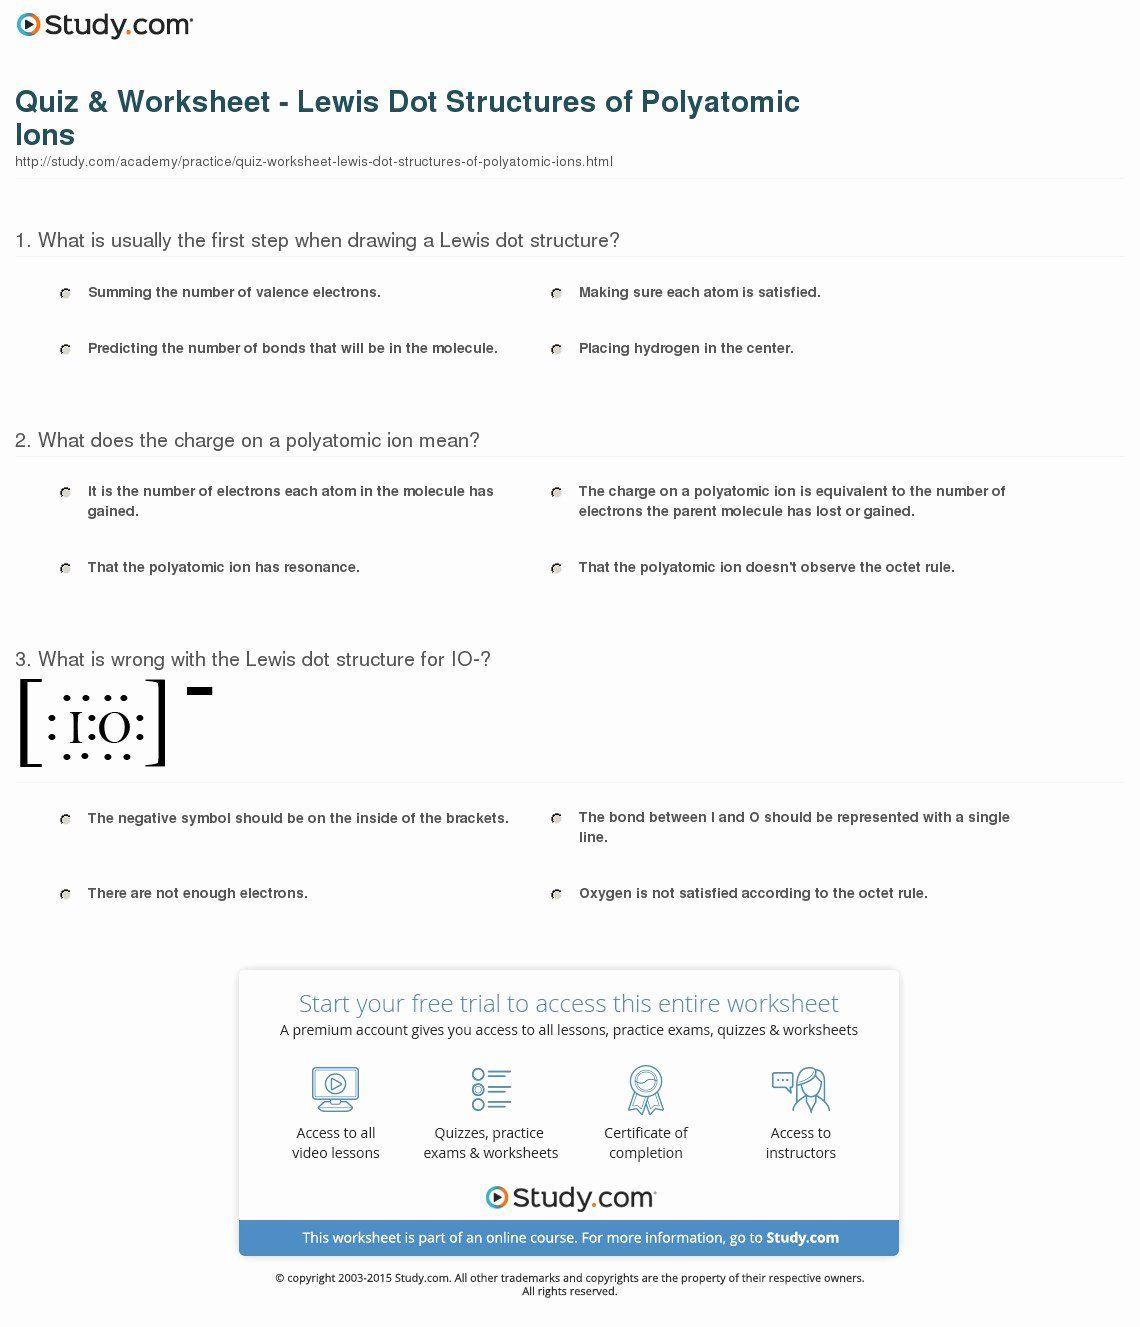 Polyatomic Ions Worksheet Answers